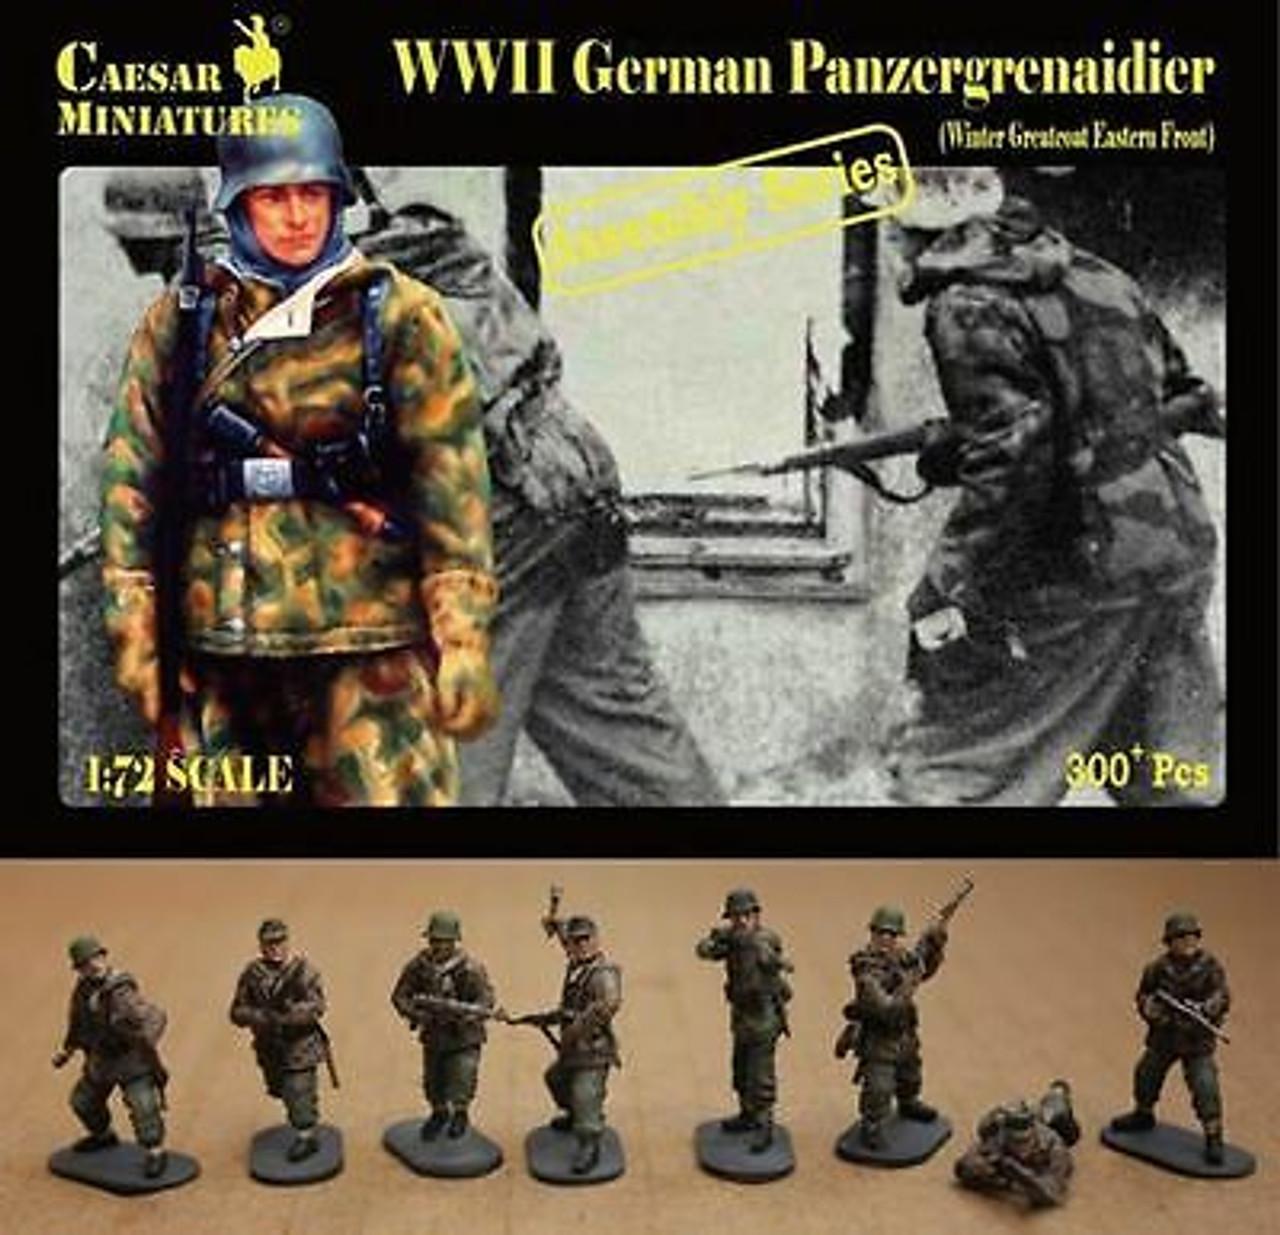 Caesar Miniatures 7714 WWII German Panzergrenaidie